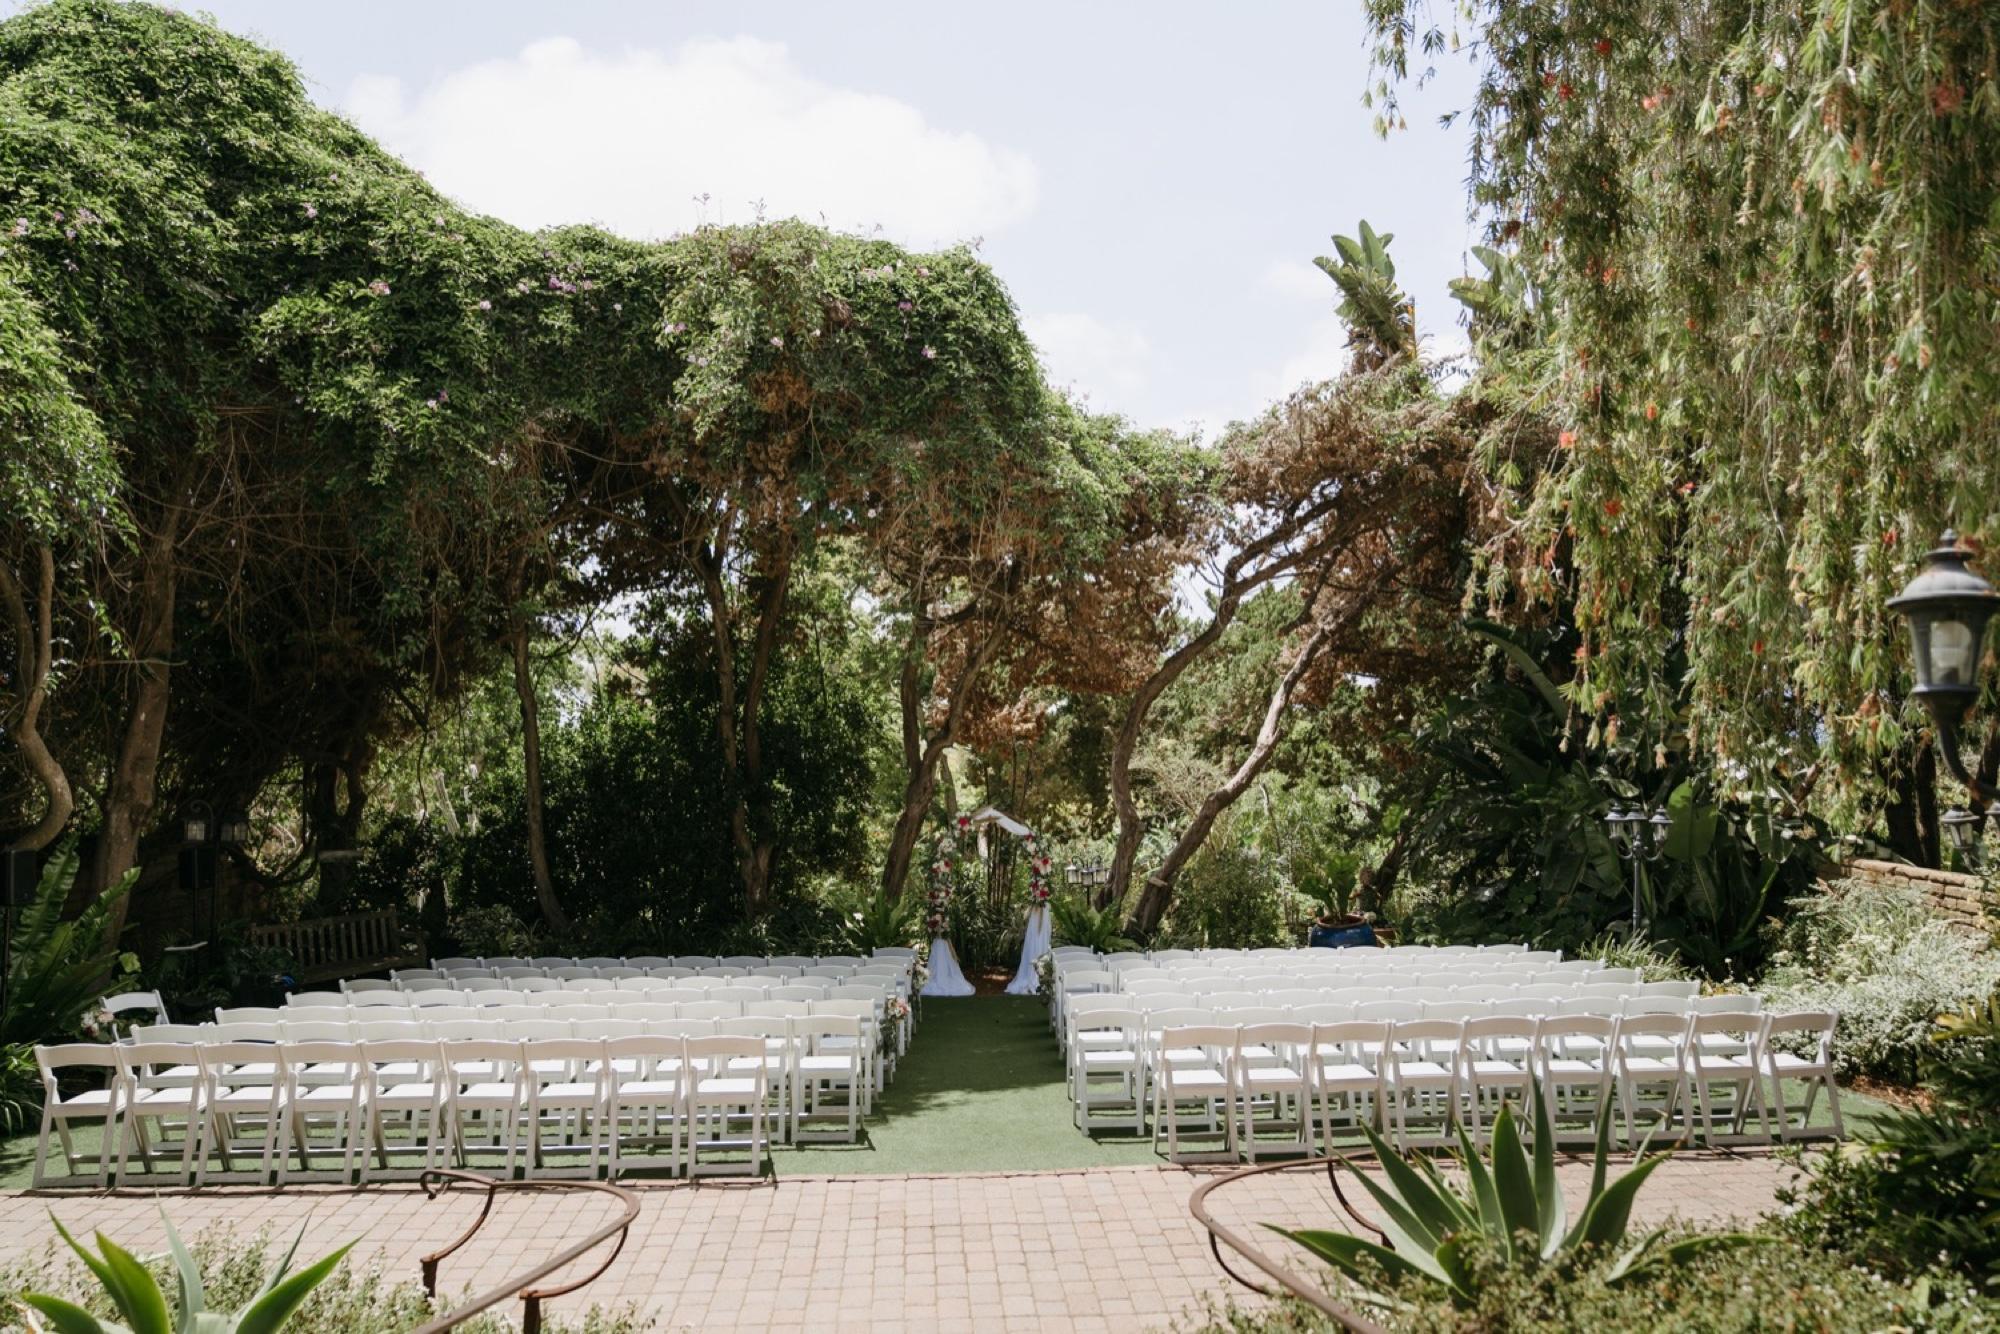 001_Shawna and Steve's Wedding-2_botanical_garden_san_diego.jpg